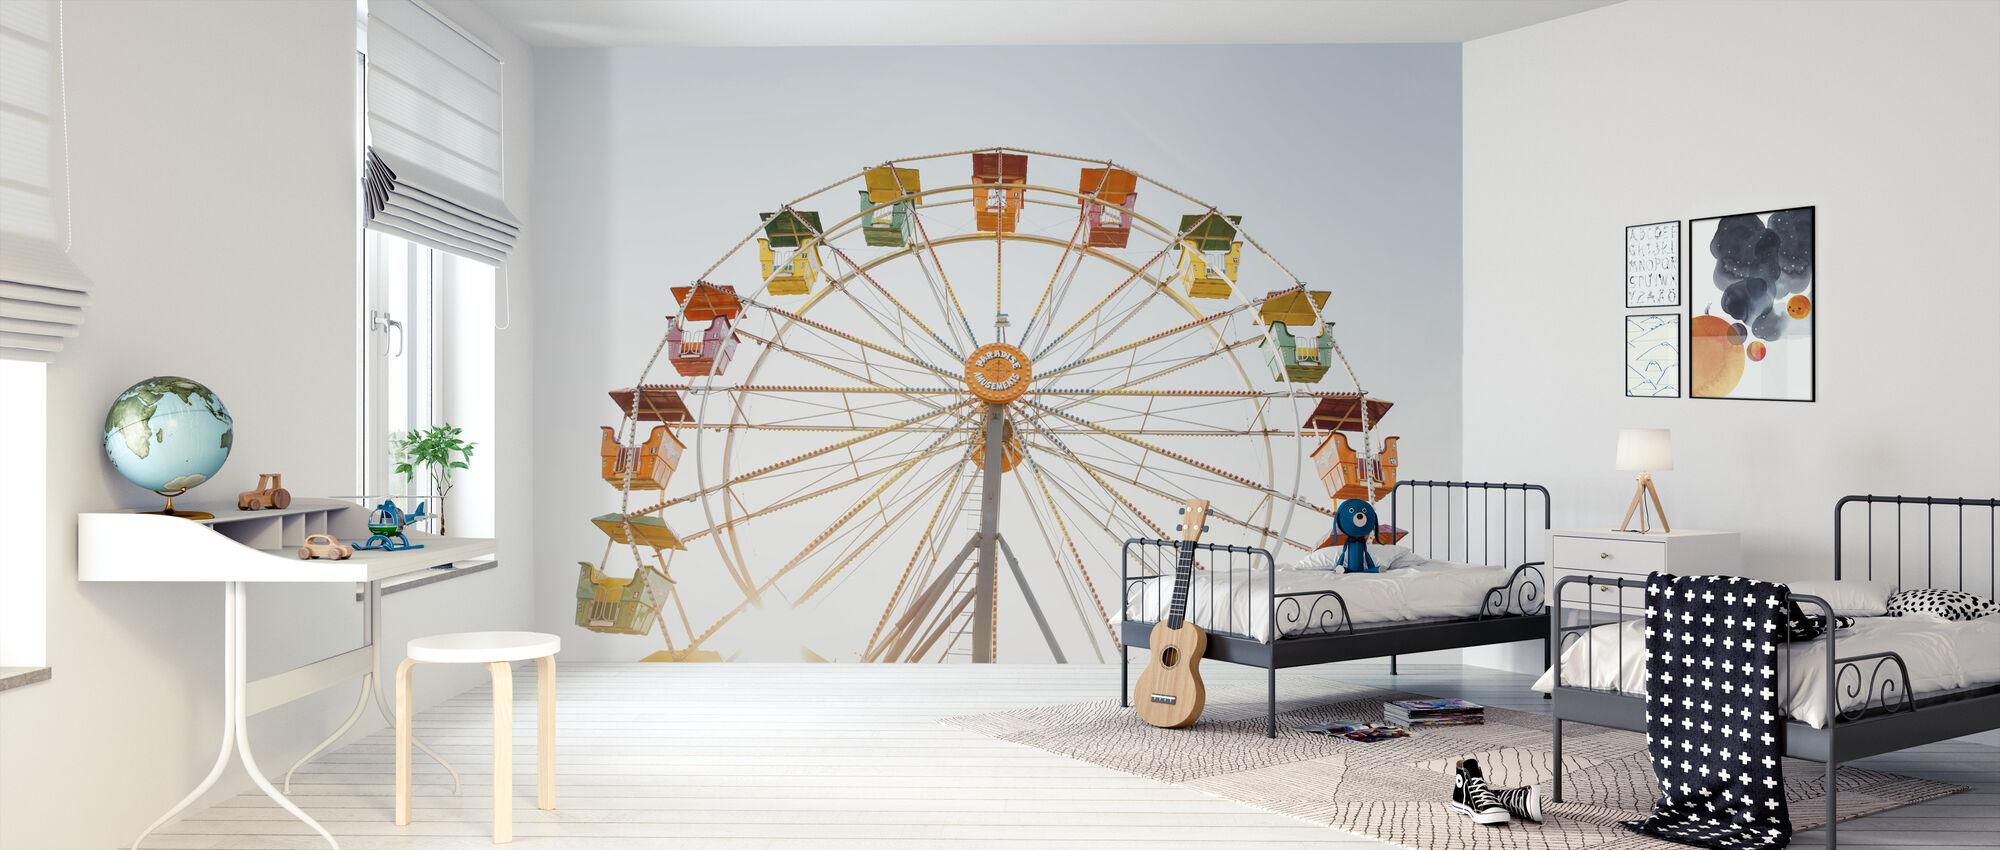 Amusement Park Ferris Wheel - Wallpaper - Kids Room